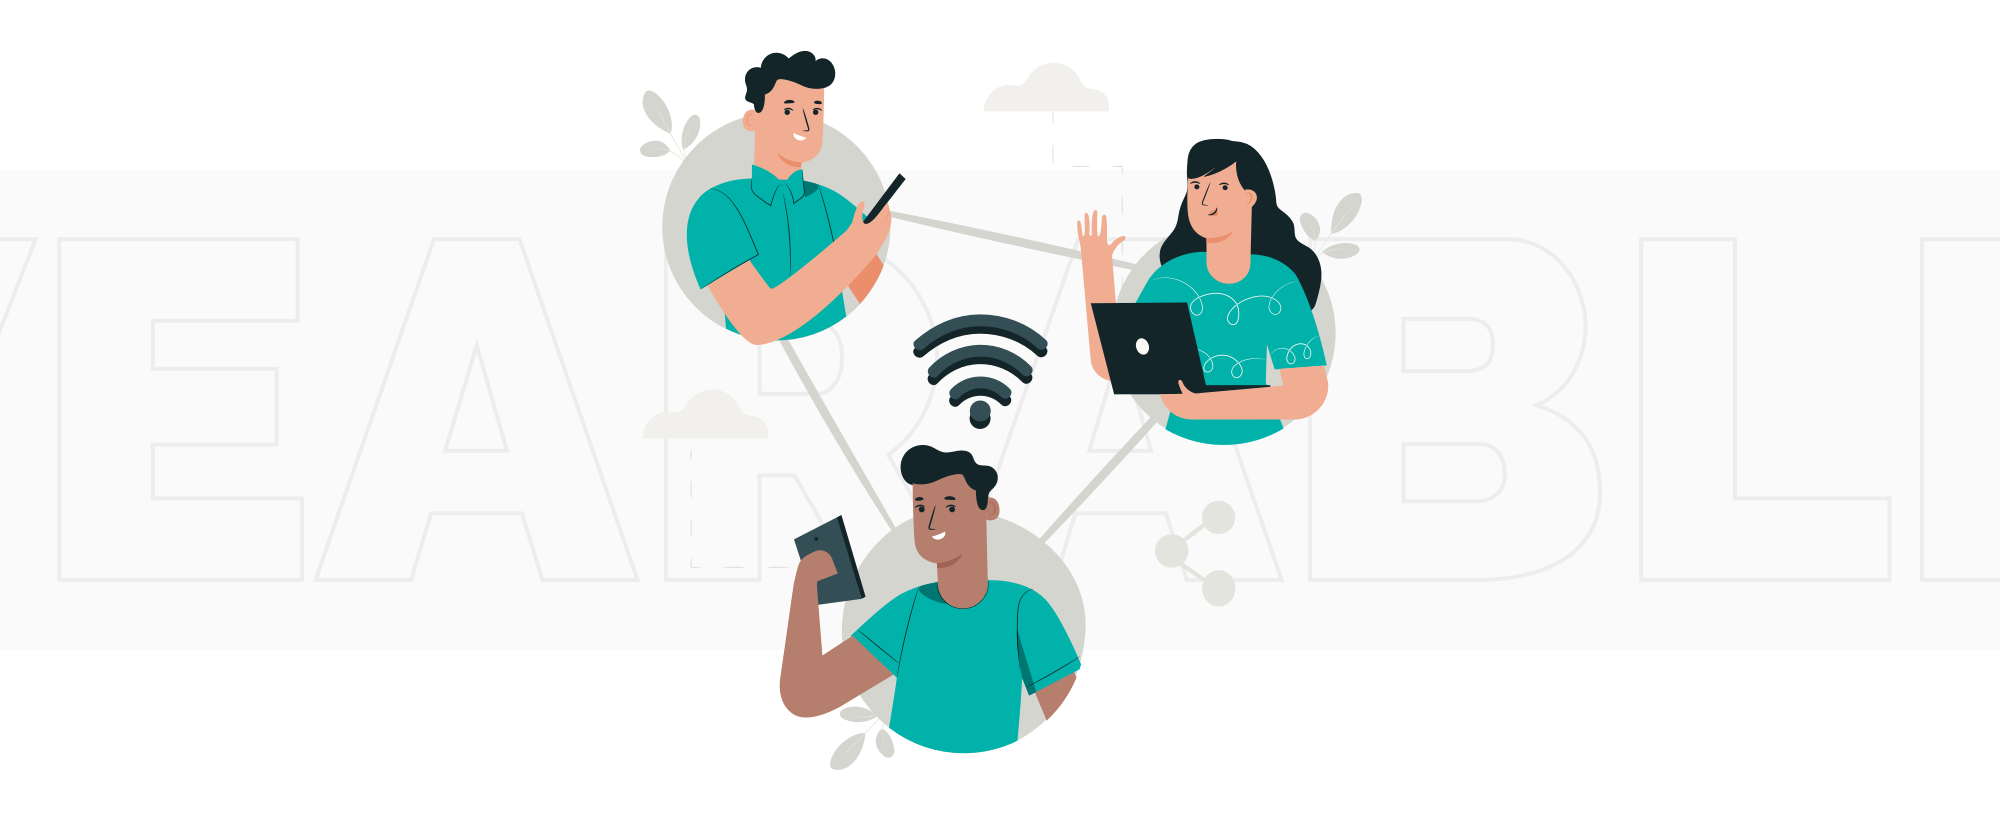 Top Marketing Technology Trends